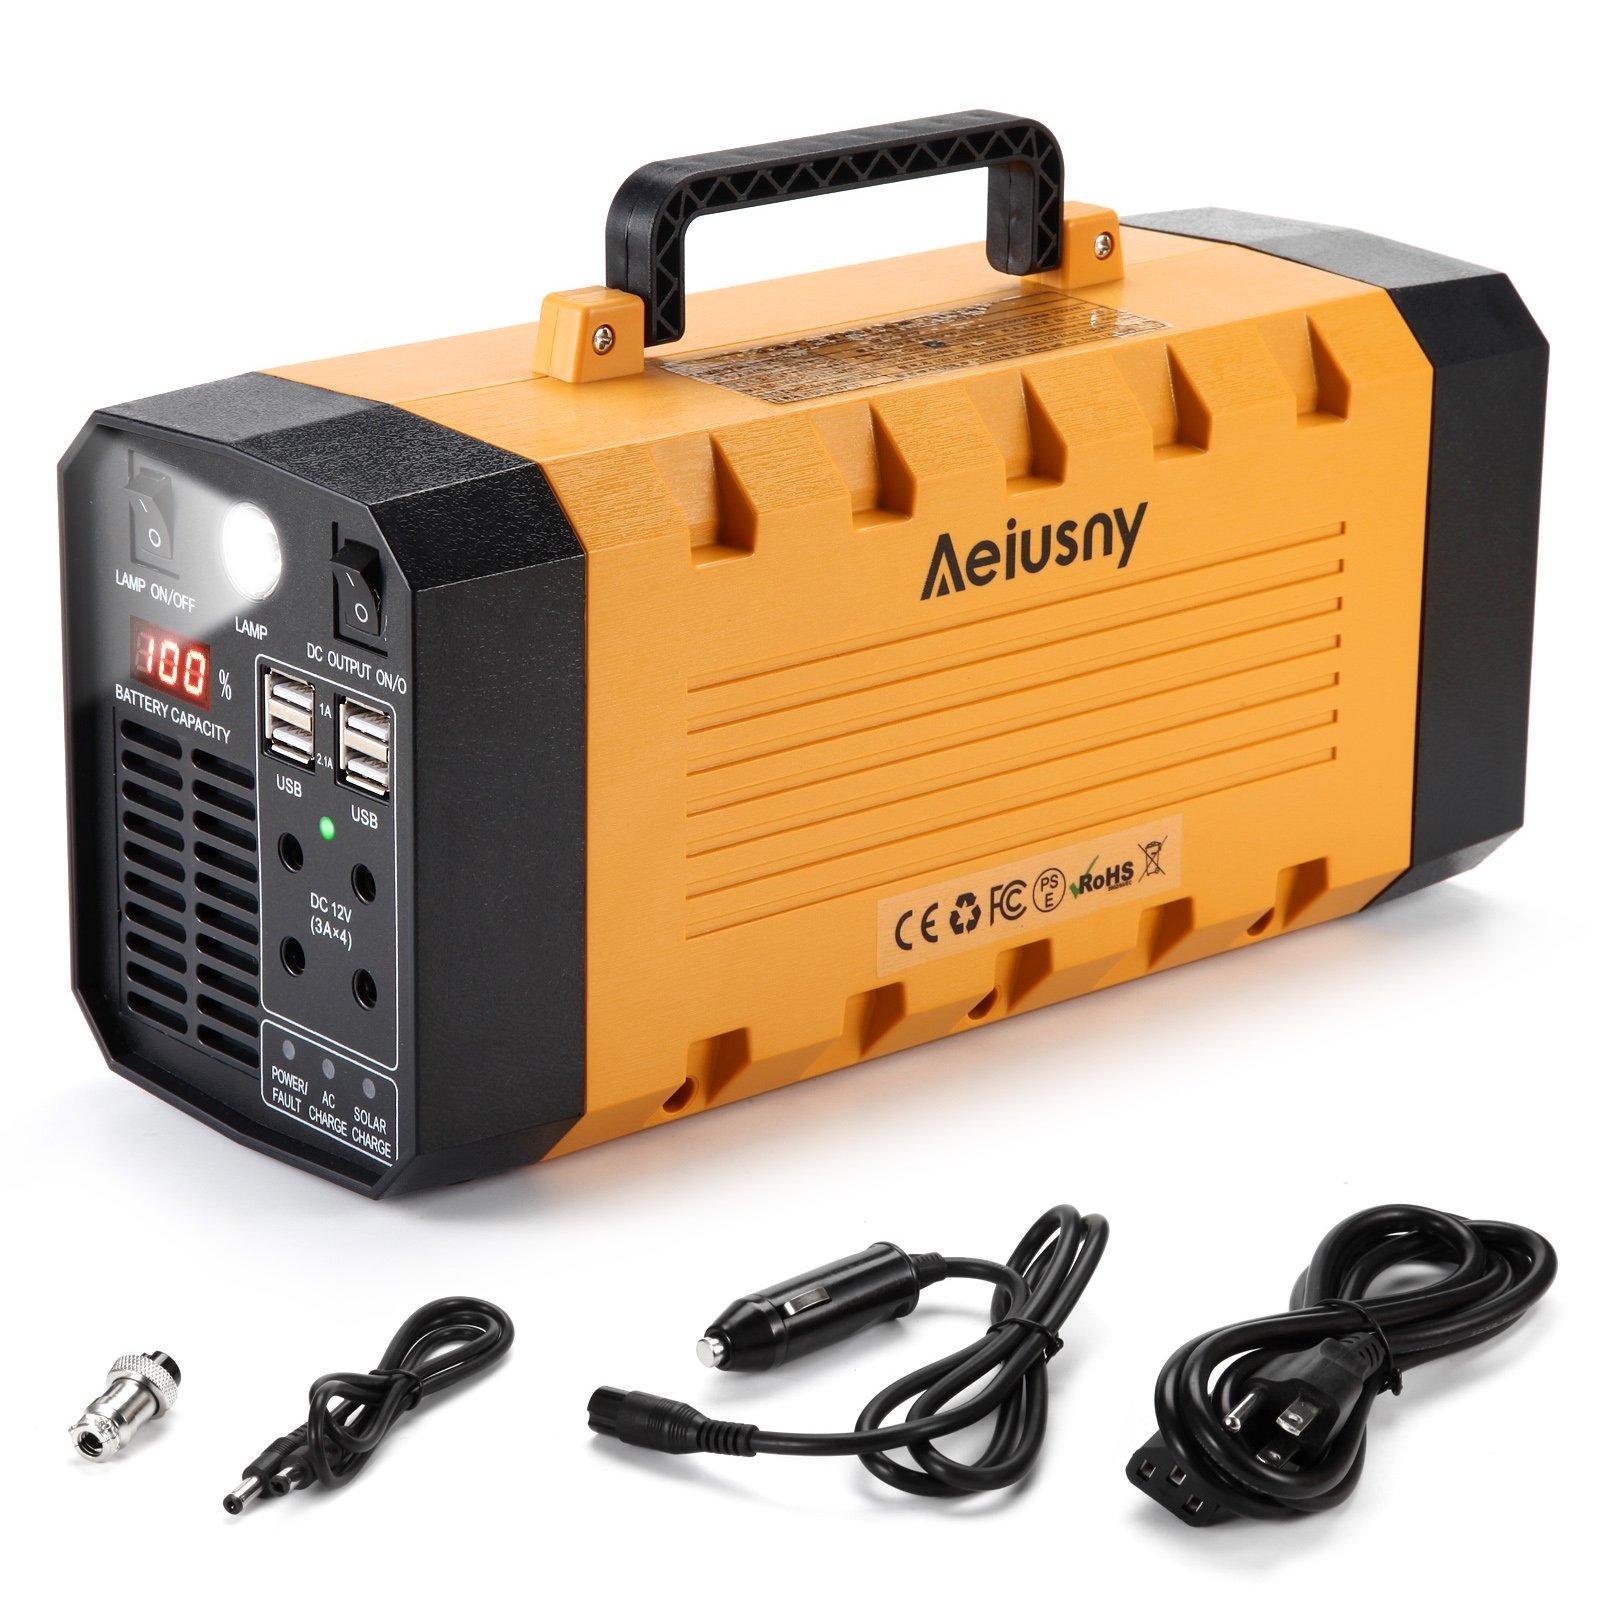 Aeiusny Portable Generator Station Emergency